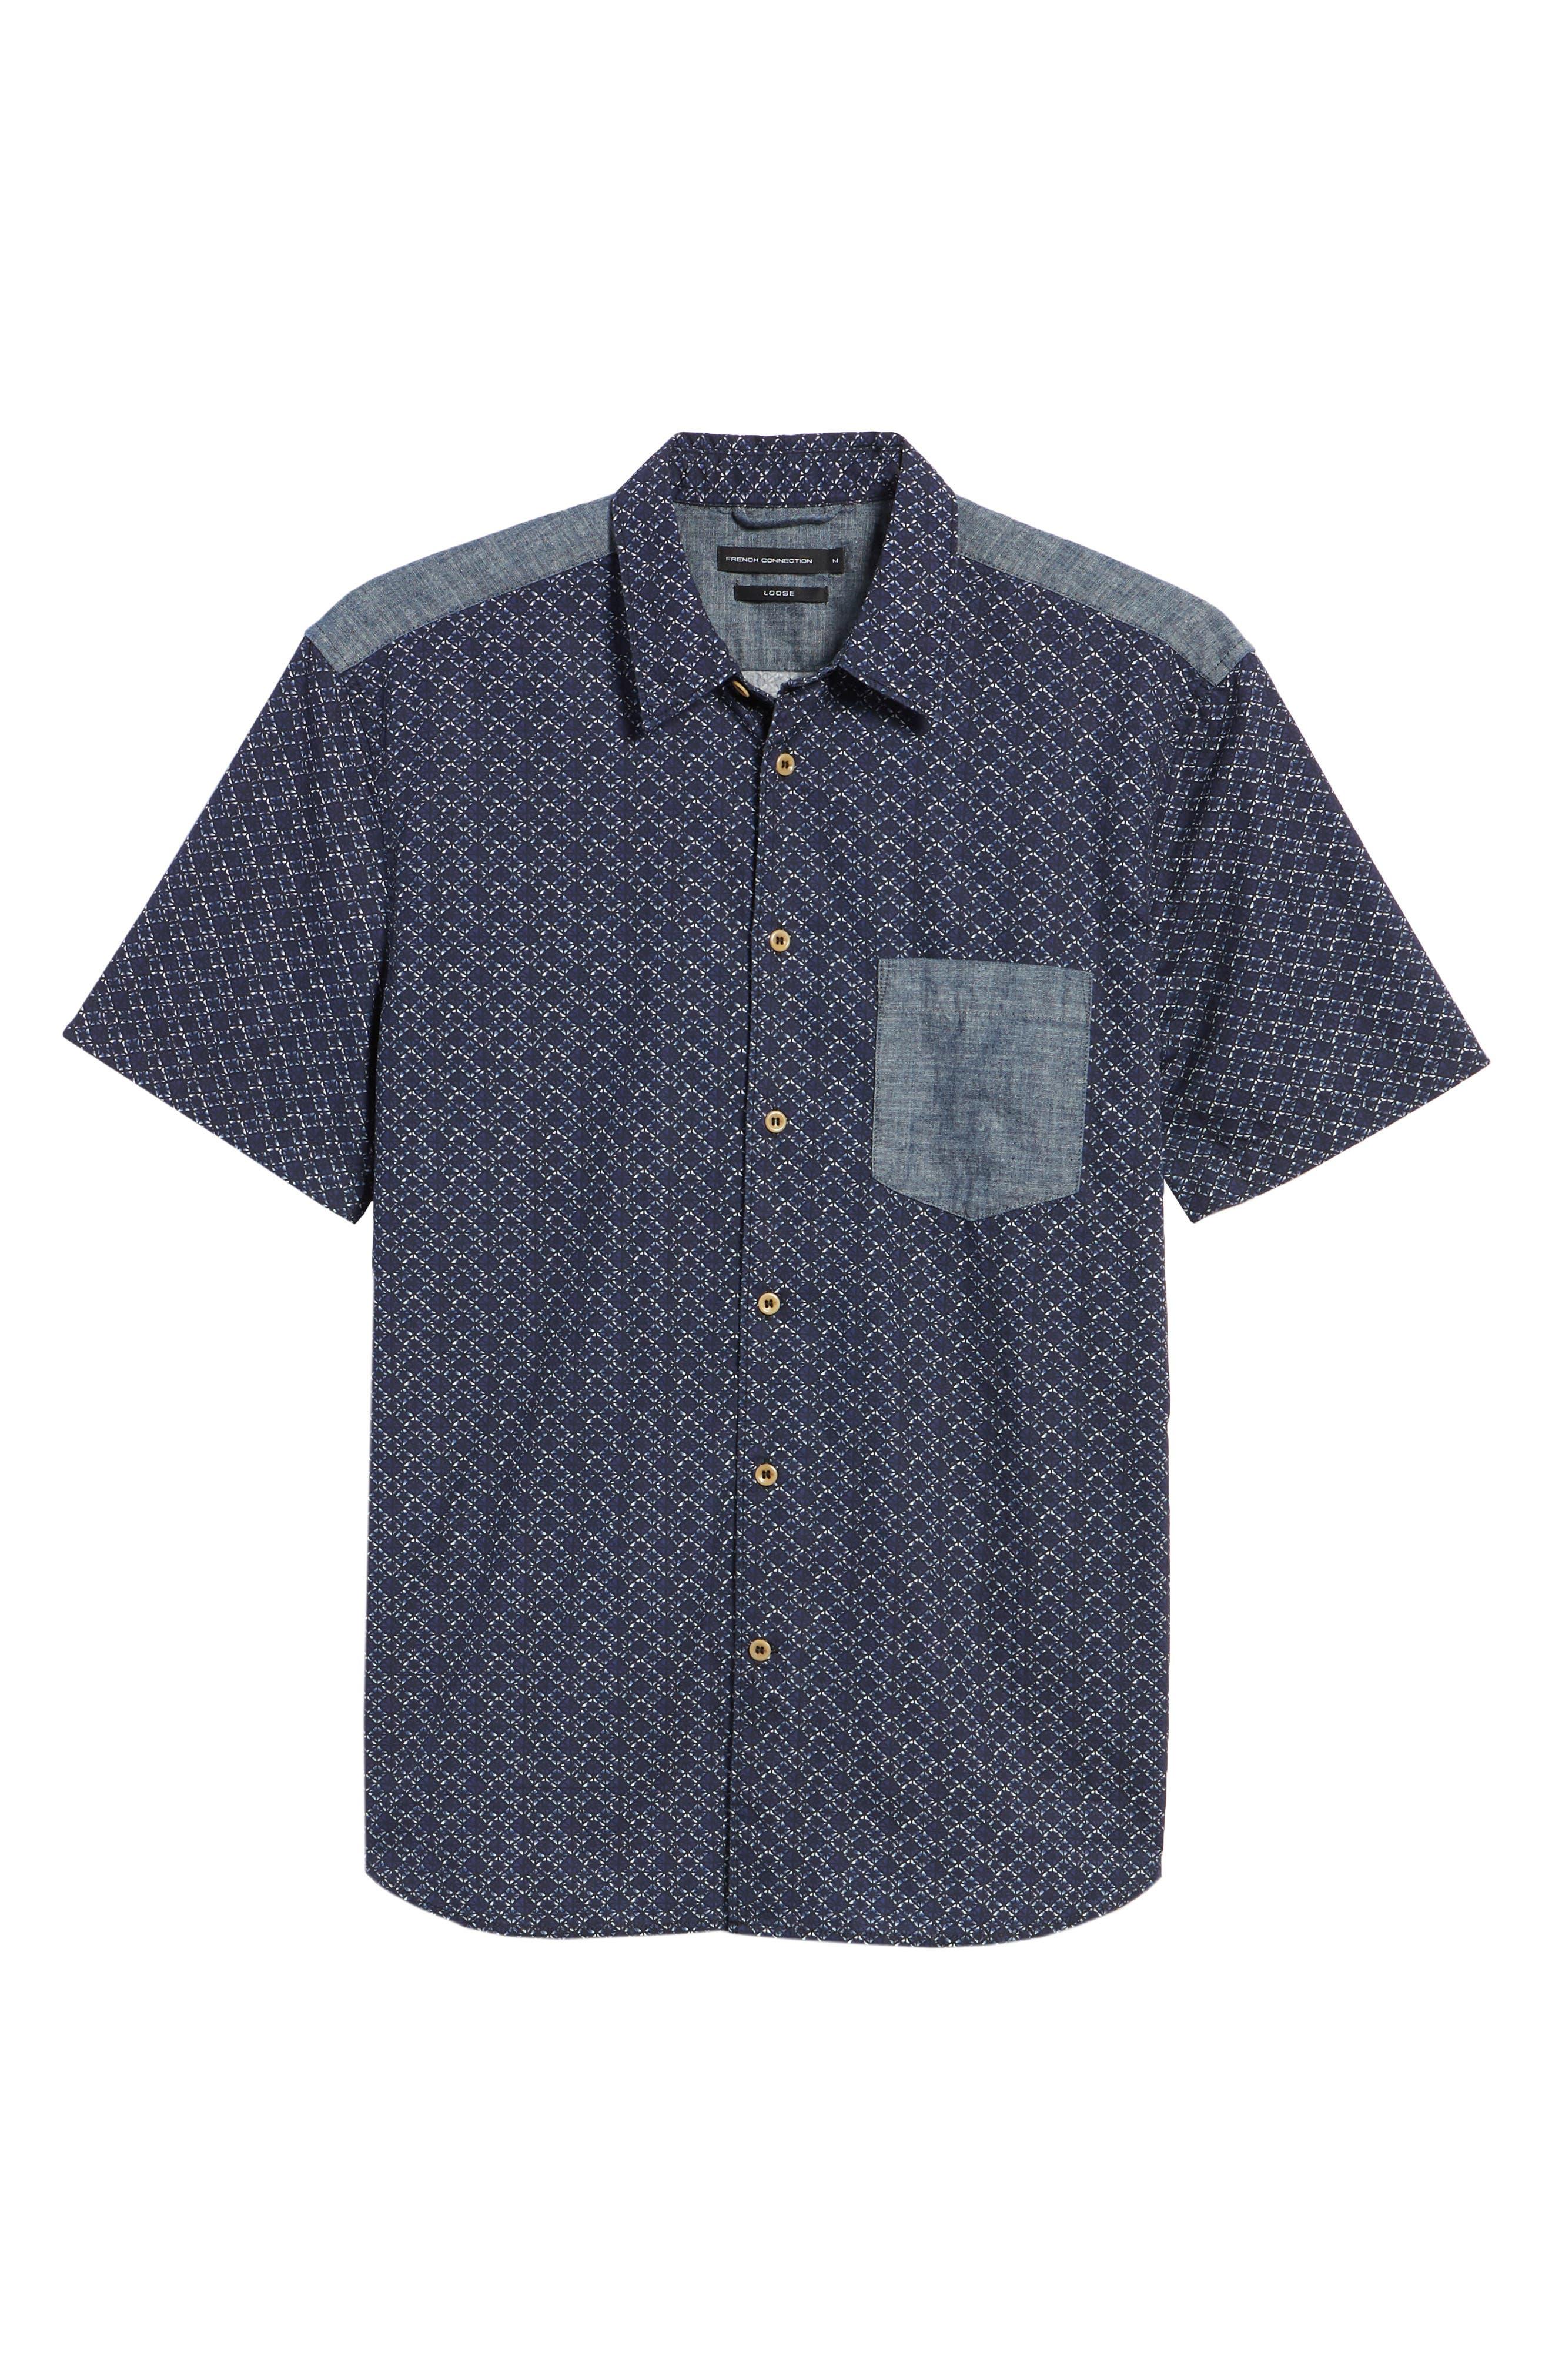 Kast Relaxed Fit Short Sleeve Sport Shirt,                             Alternate thumbnail 6, color,                             Deep Cobalt